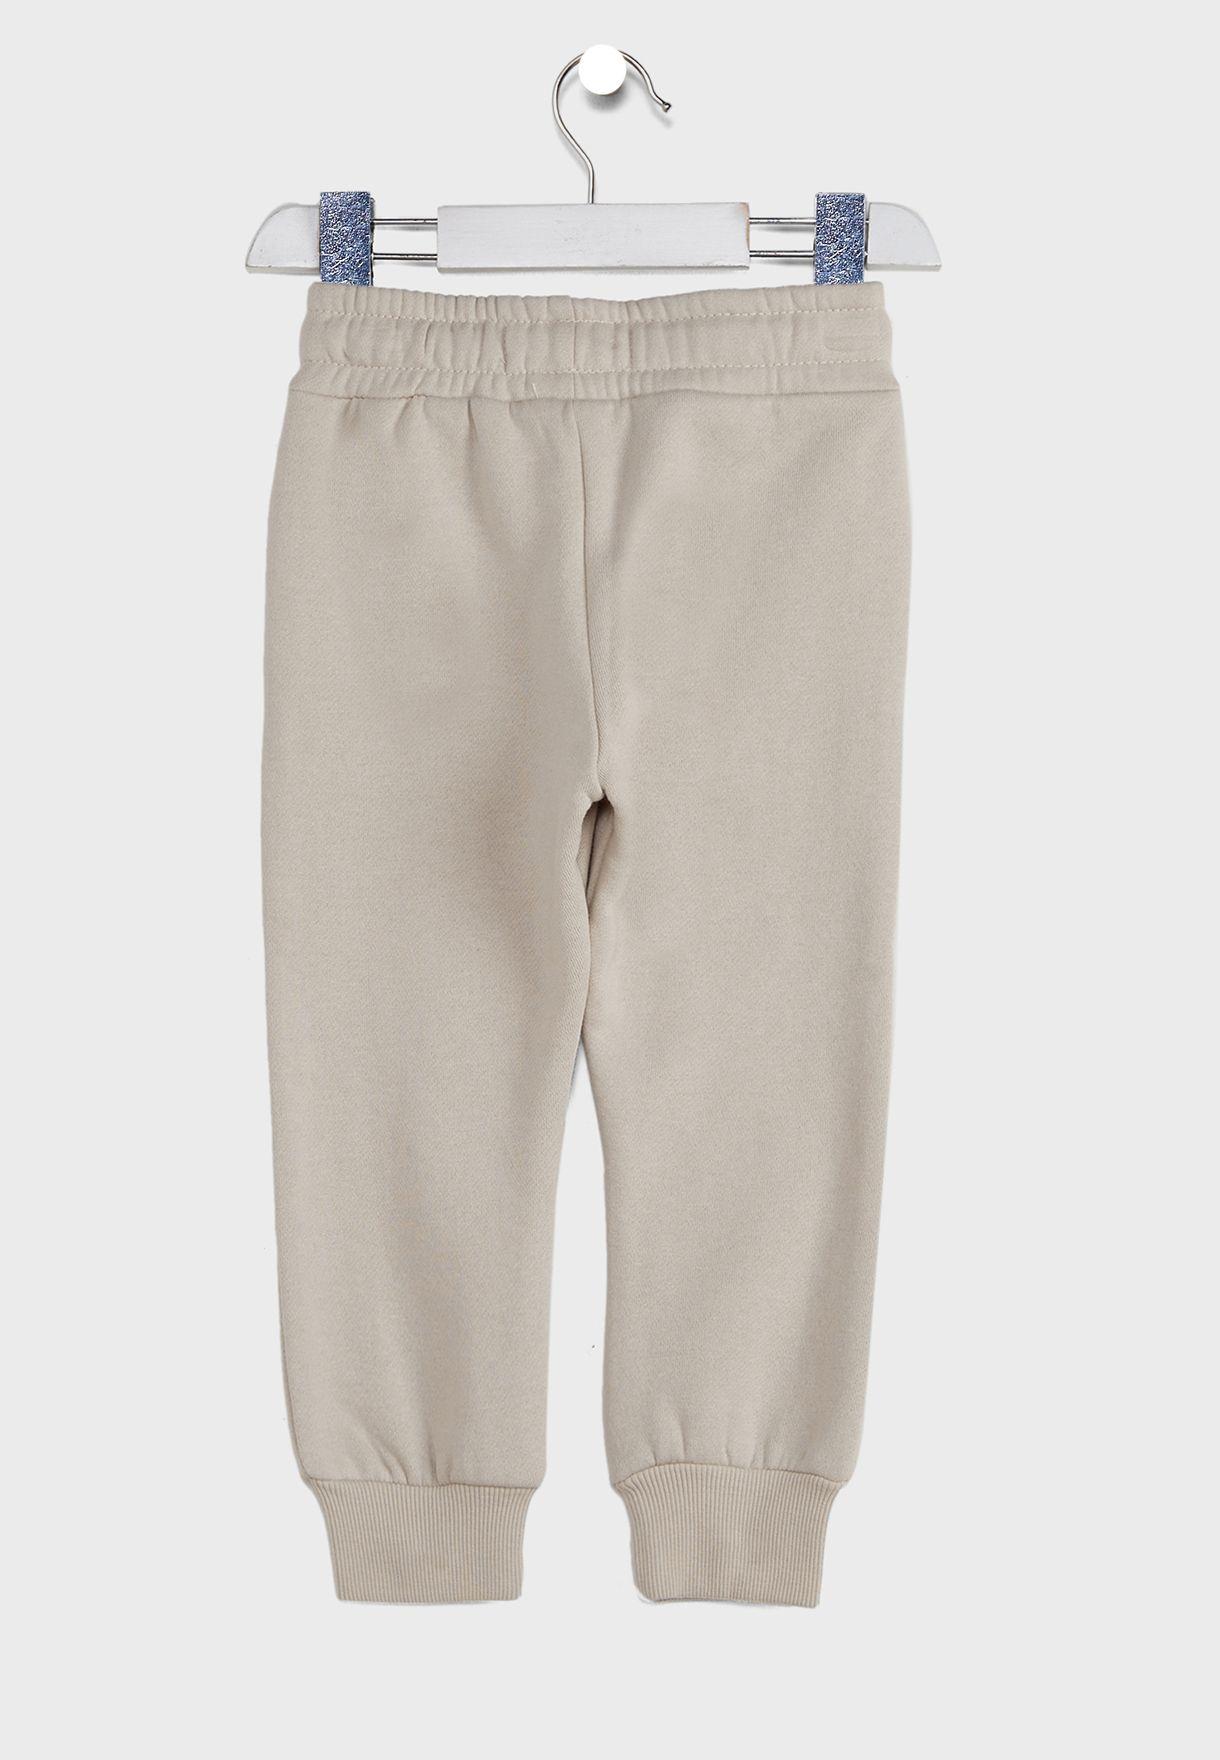 Kids Embroidered Mickey Cuffed Sweatpants